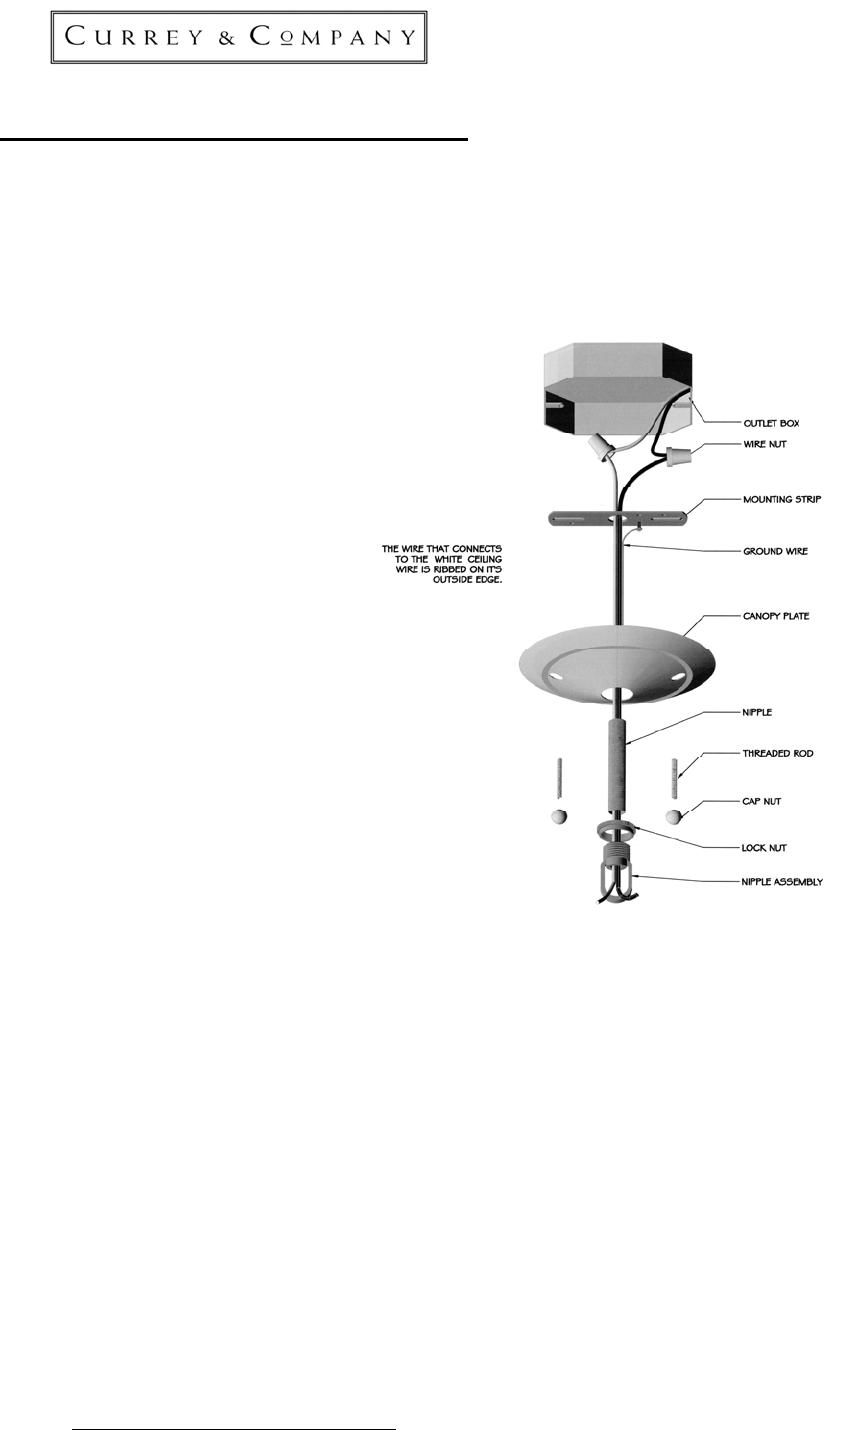 chandelier installation instructions